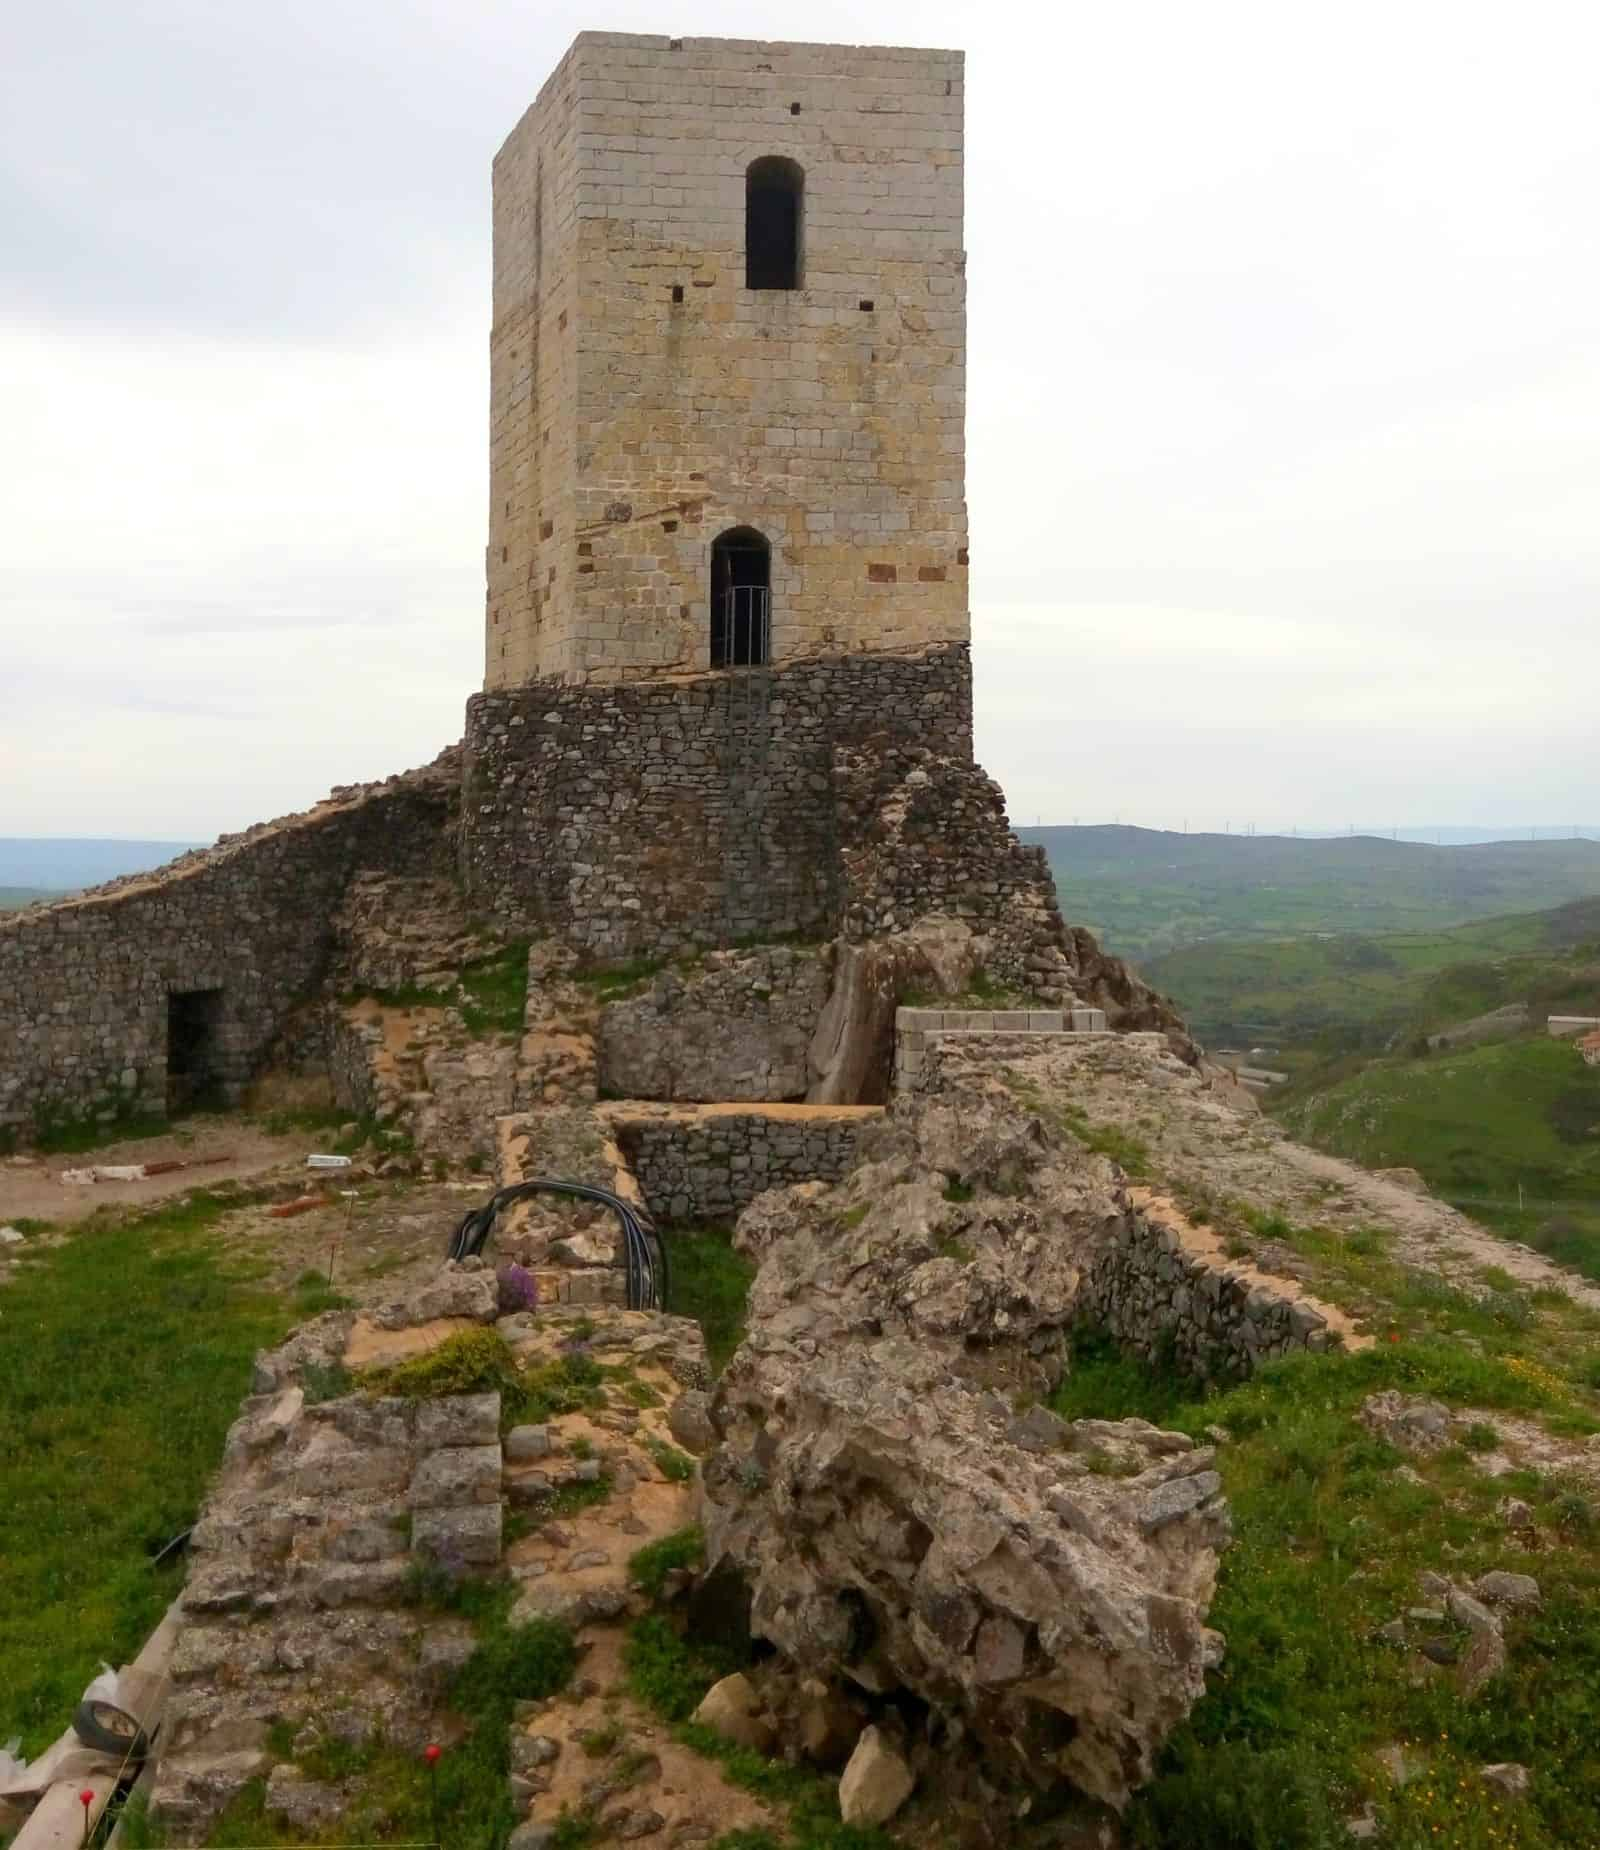 rovine_castello_medievale_osilo_malaspina